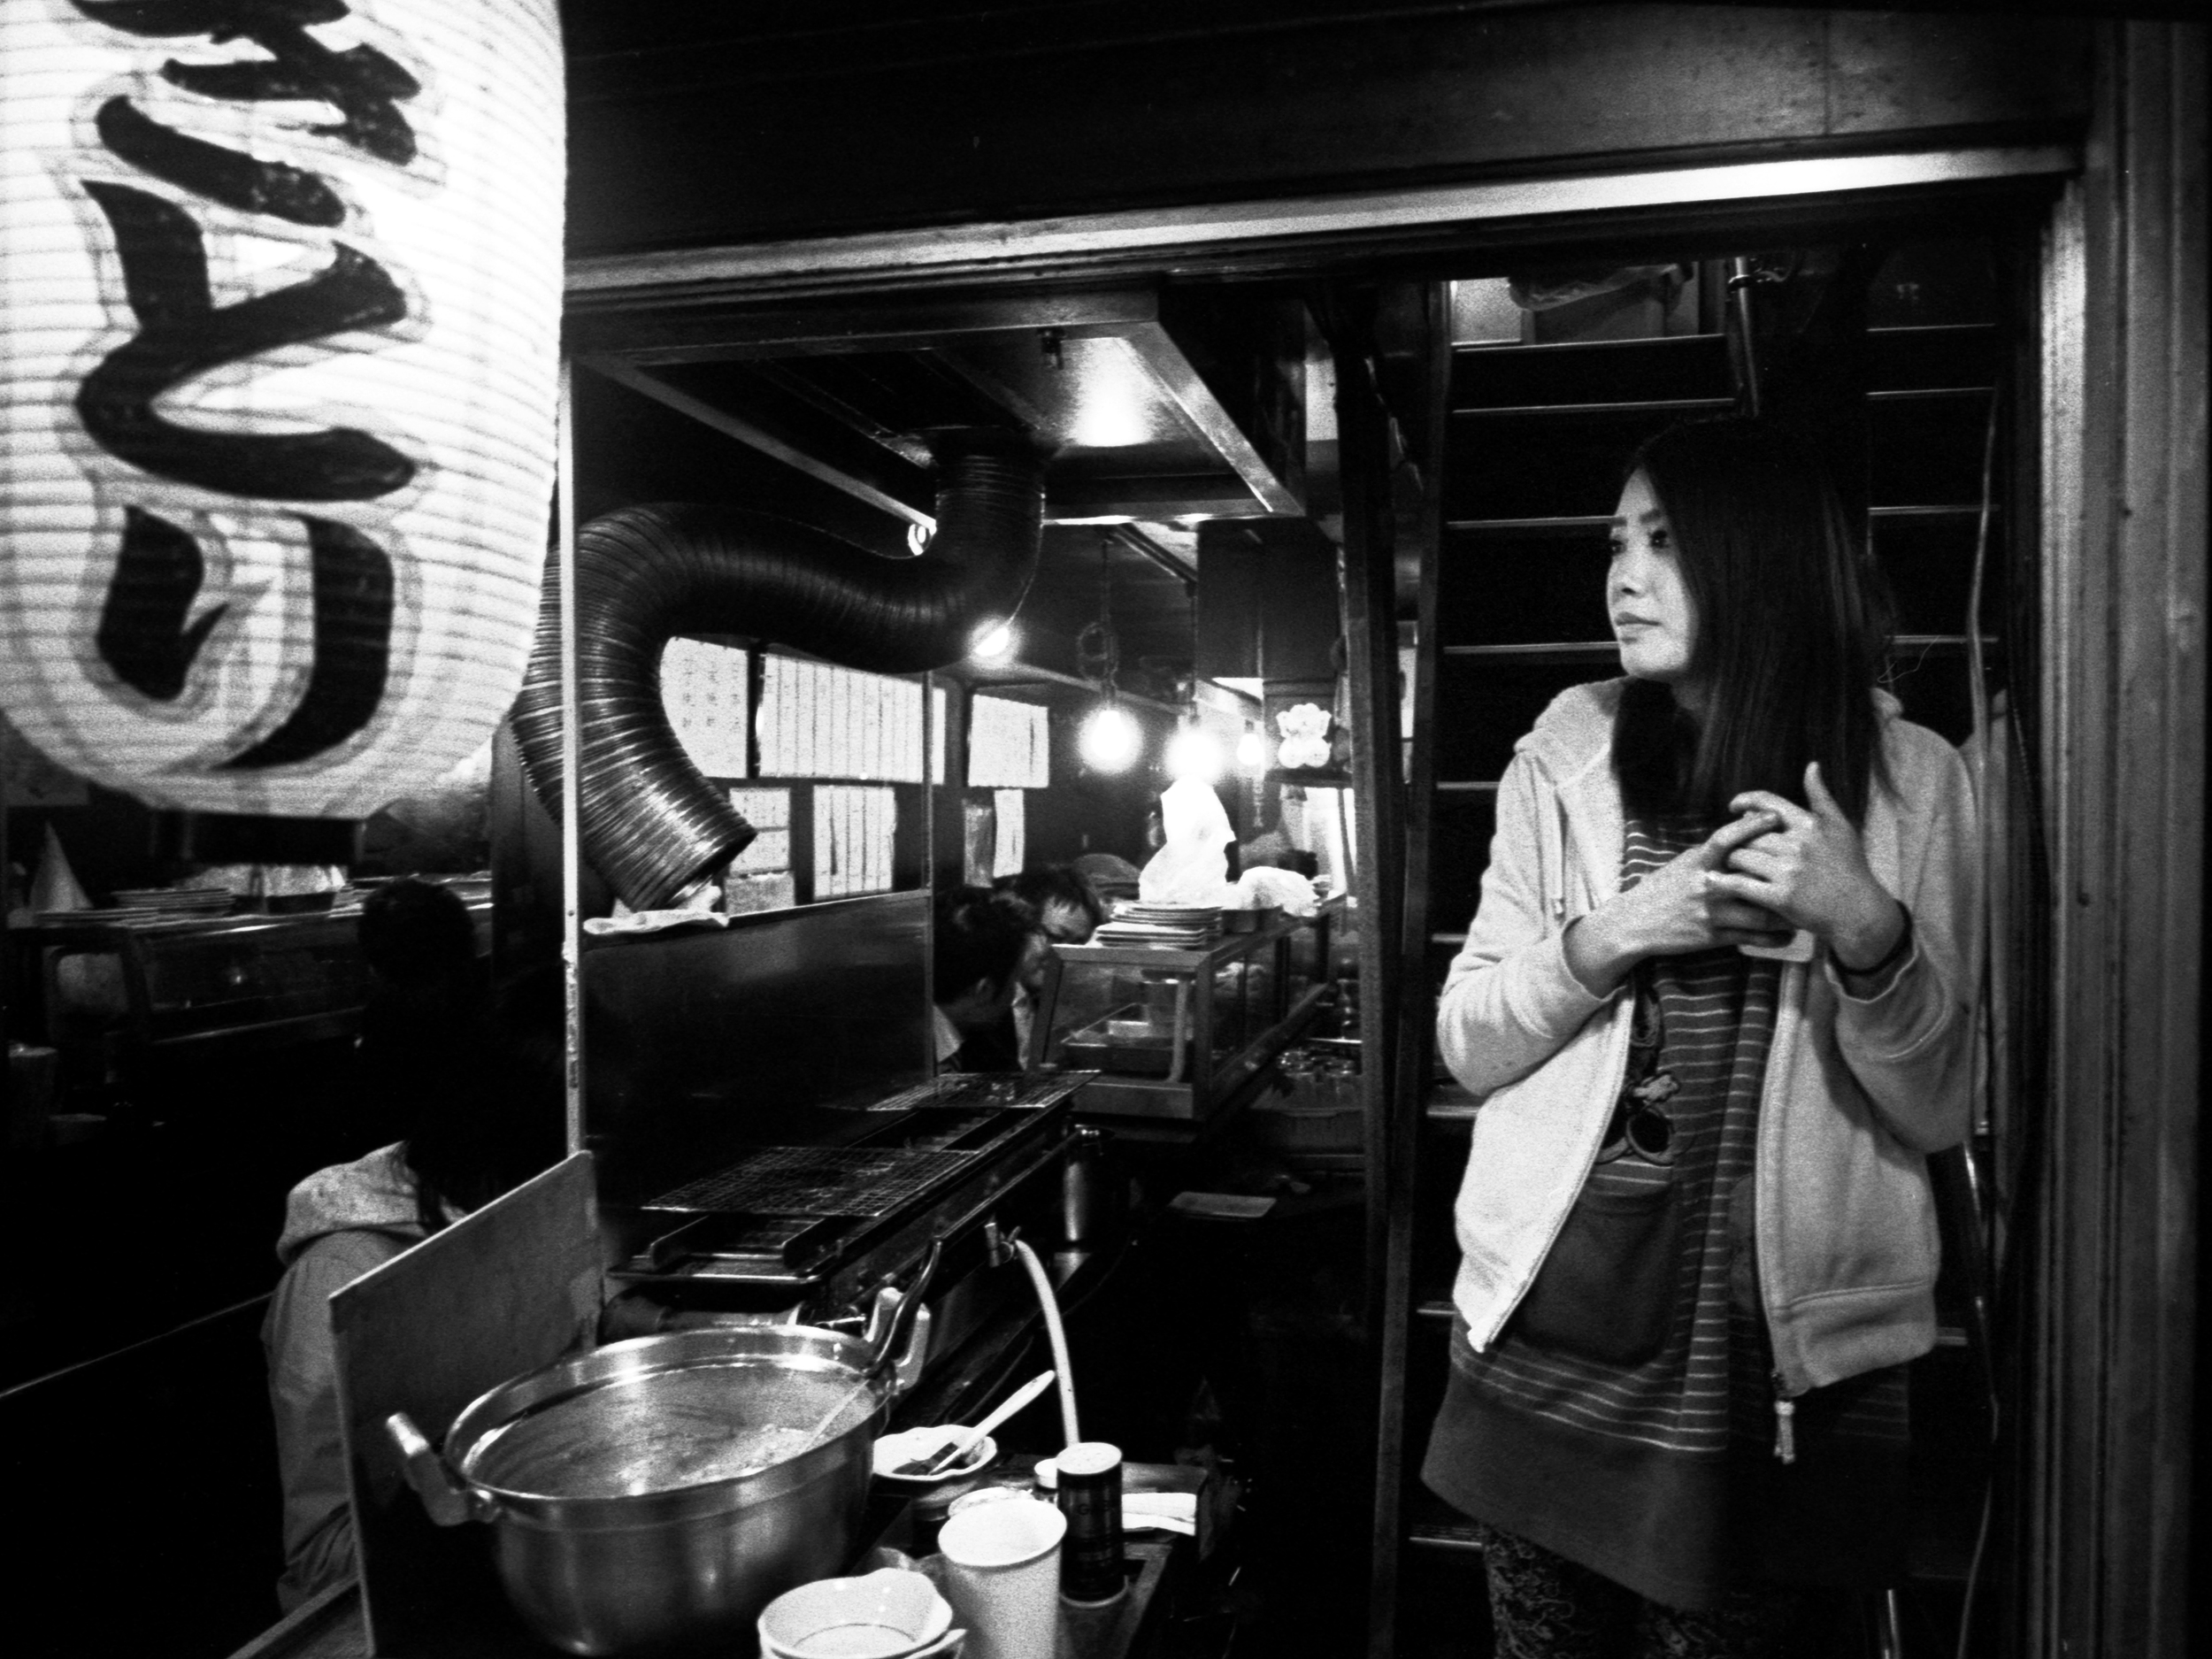 Giappone ragazza.jpg